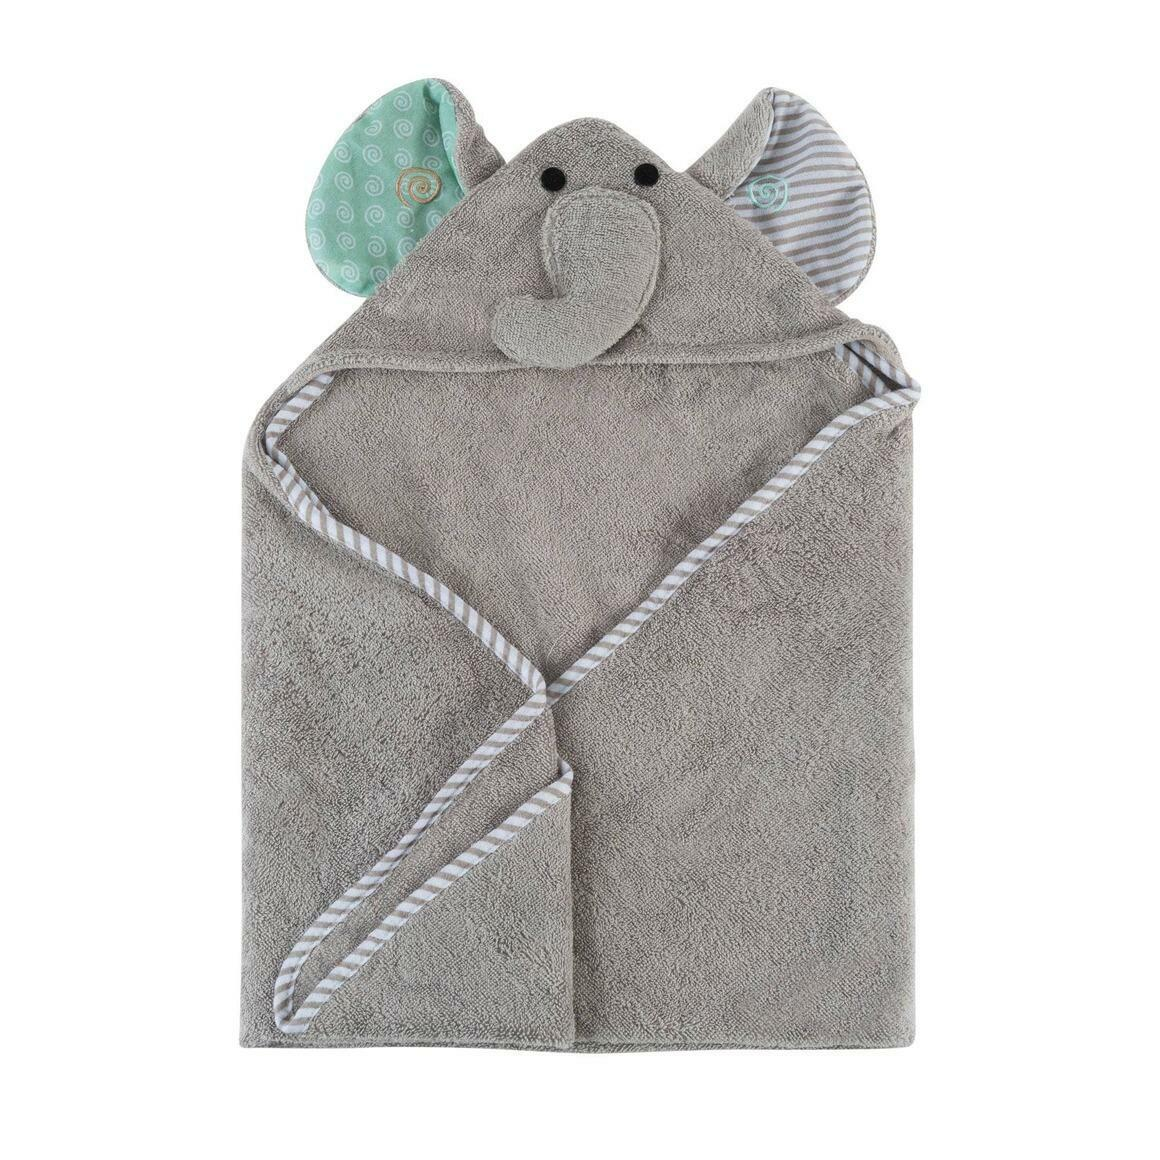 Elle the Elephant Baby Towel | Trada Marketplace